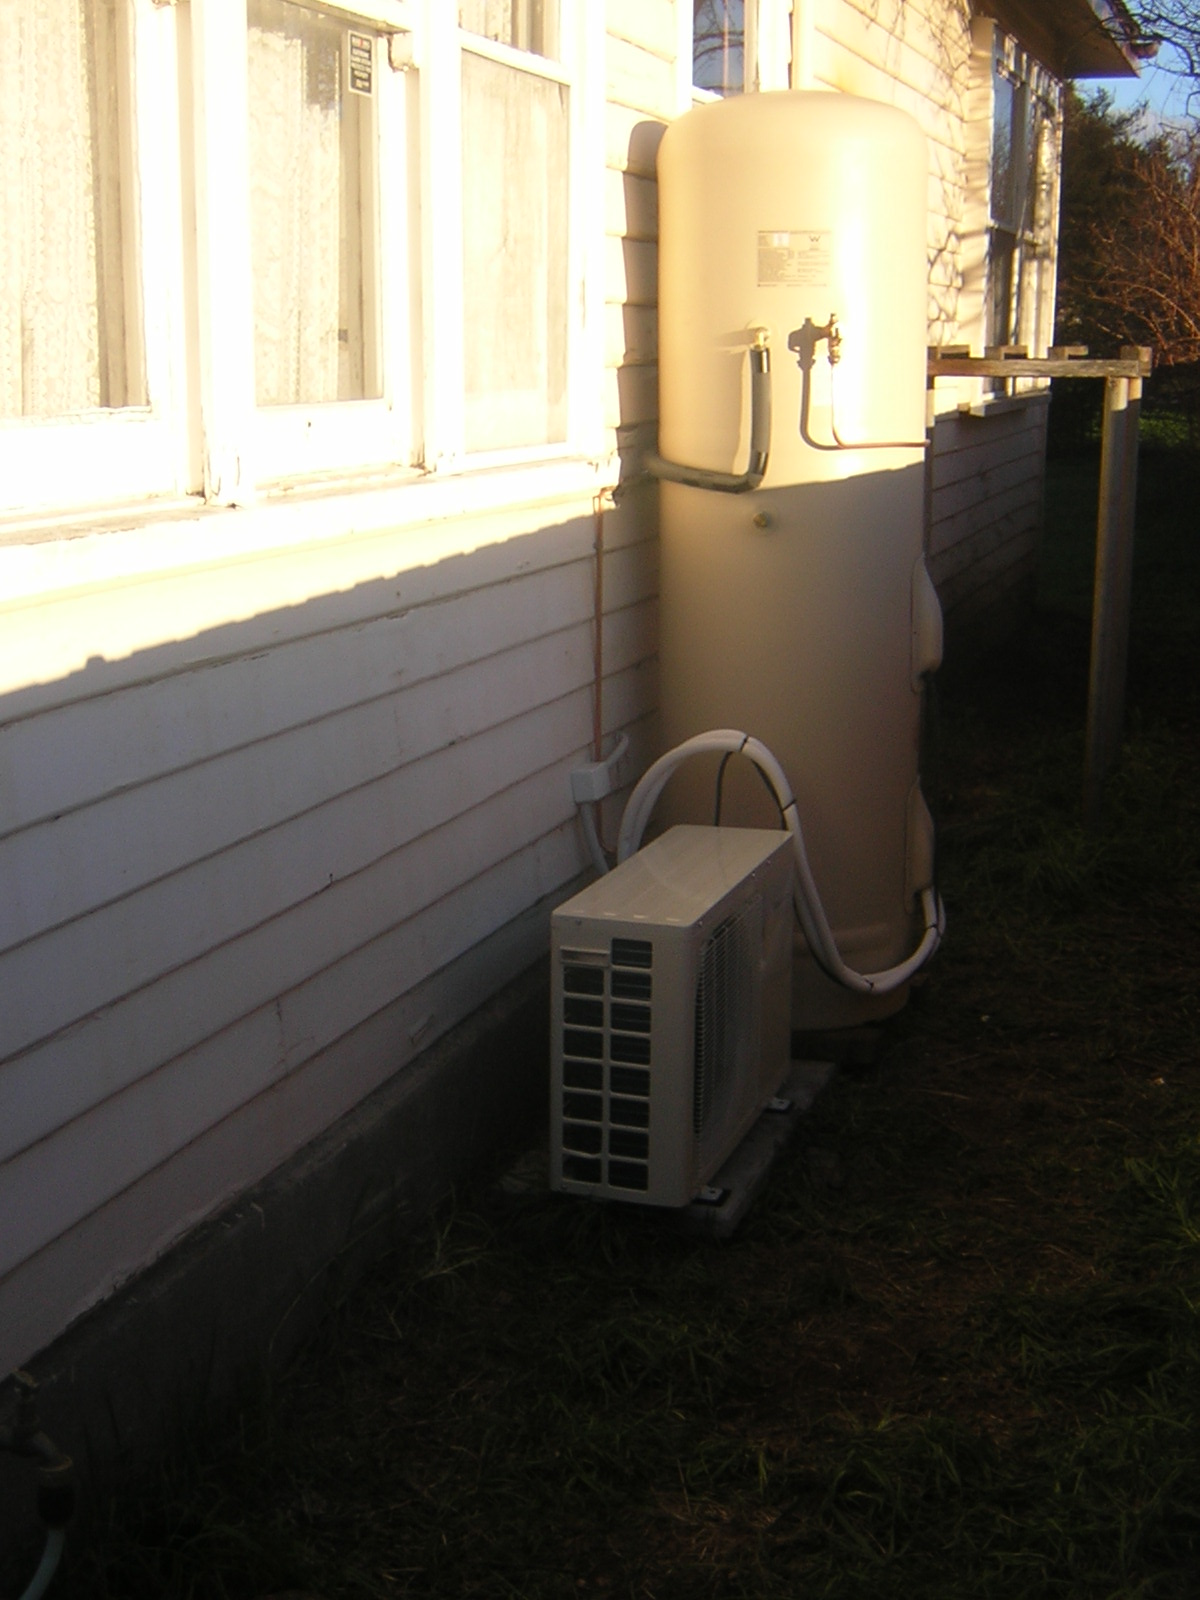 Our new Siddons heat pump